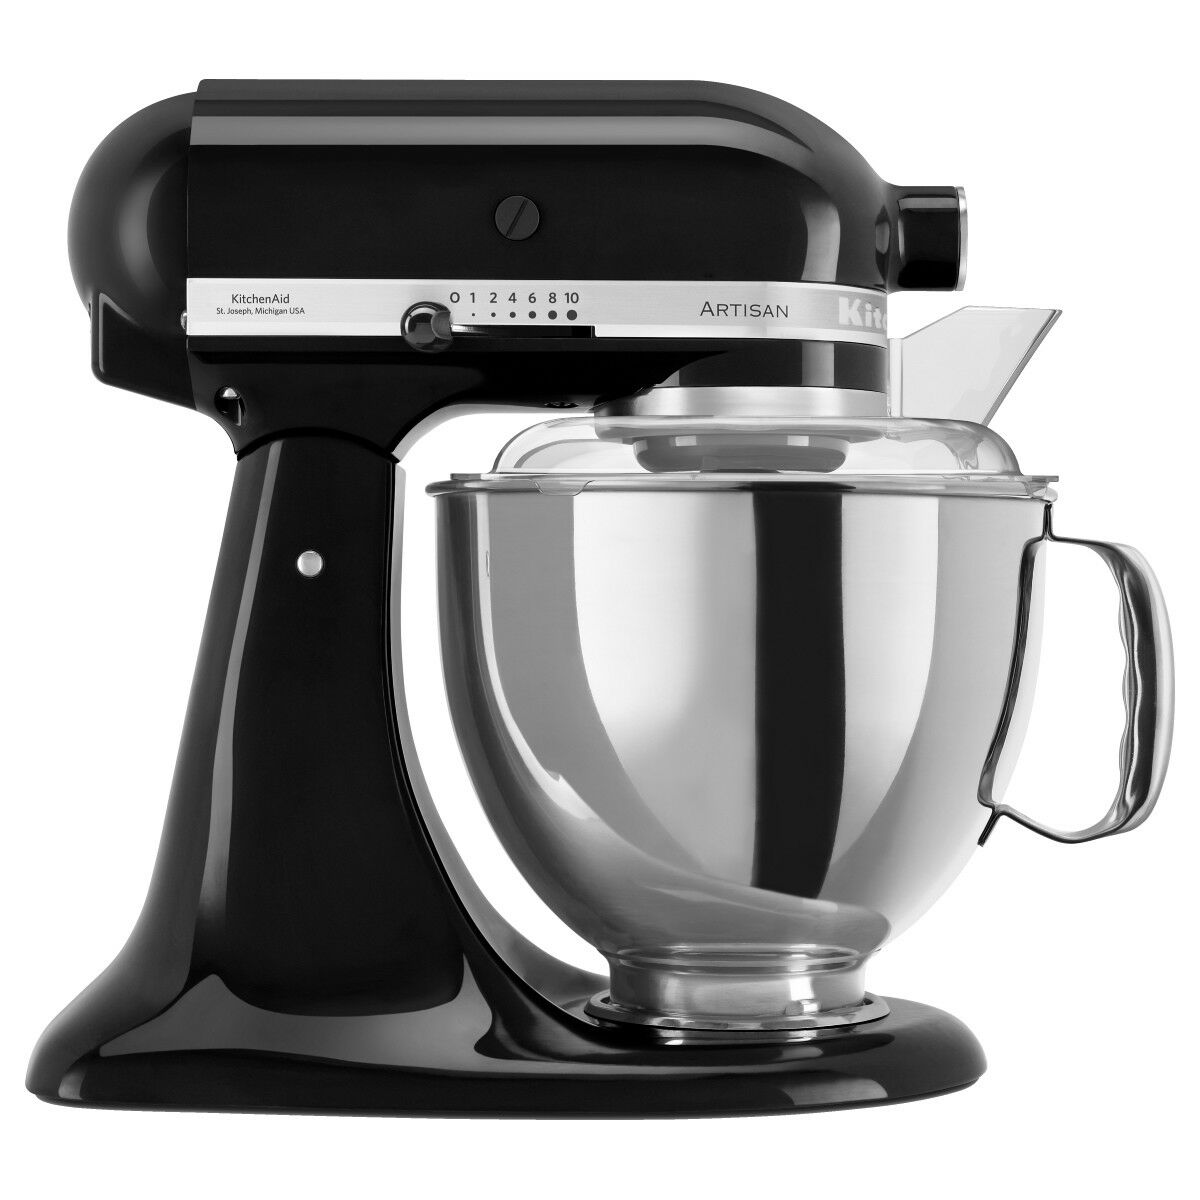 Kitchenaid Ksm175 5 Qt 4 7 Liters Artisan Stand Mixer 220